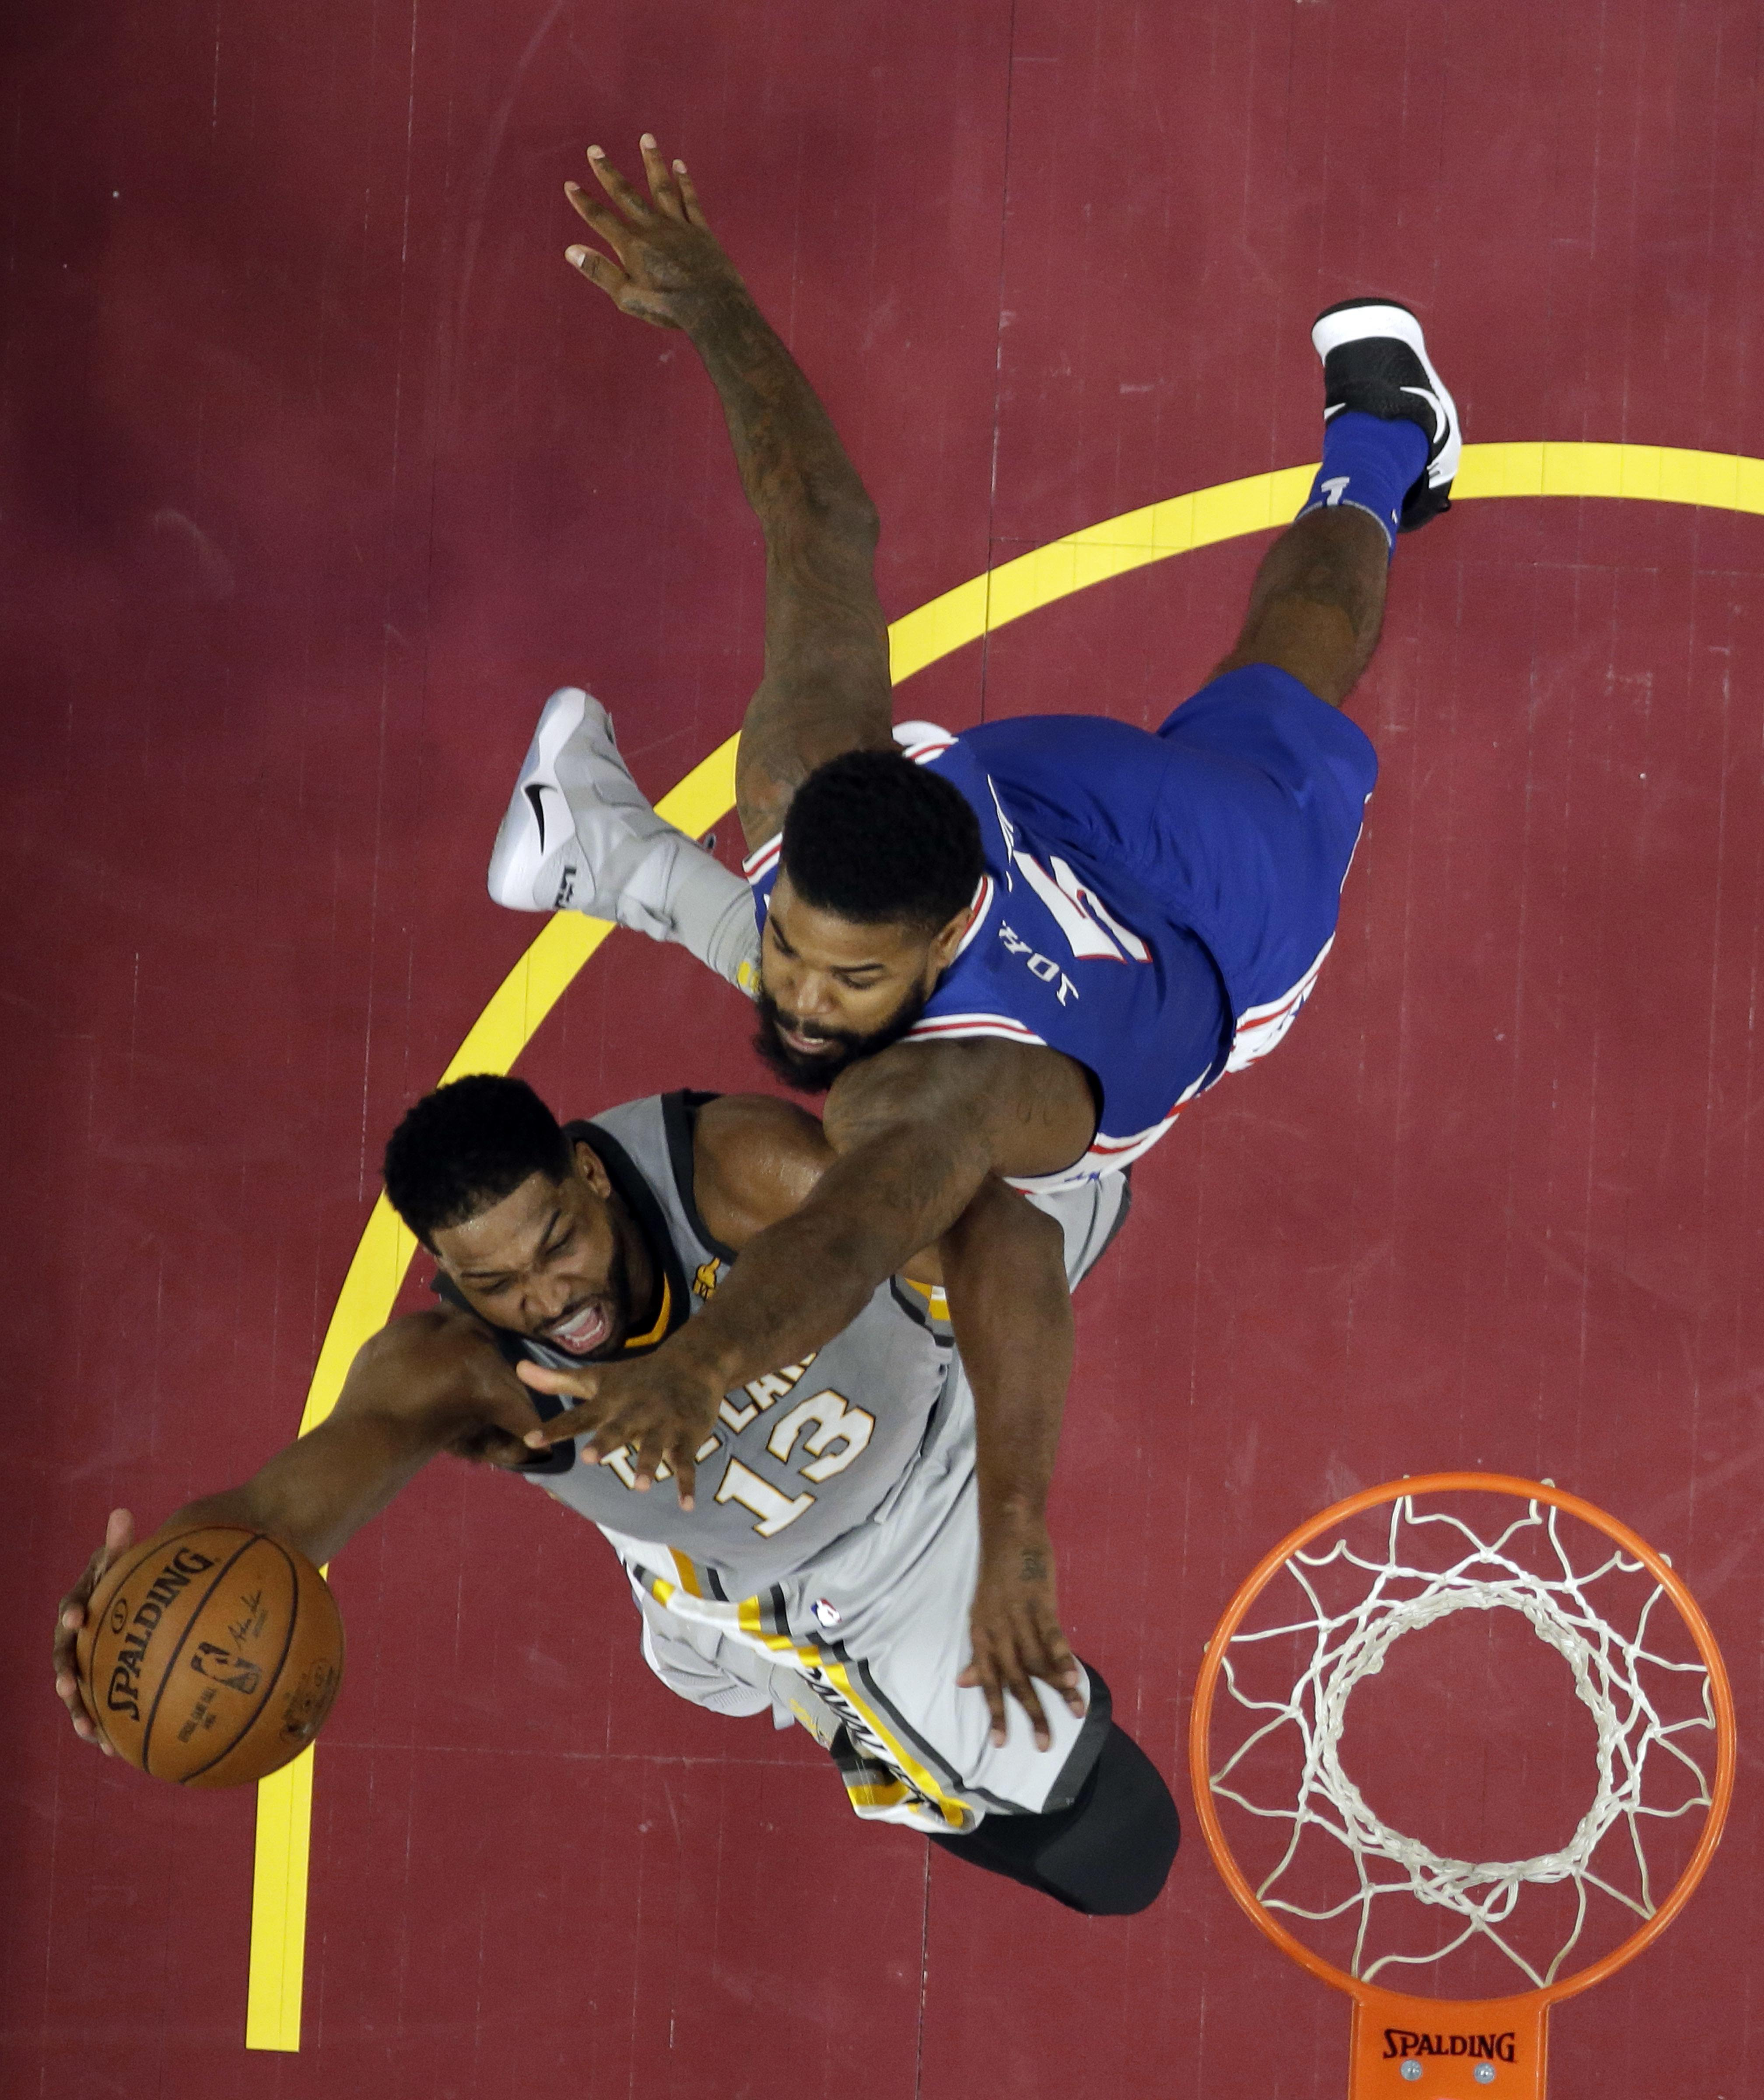 76ers_cavaliers_basketball_13266